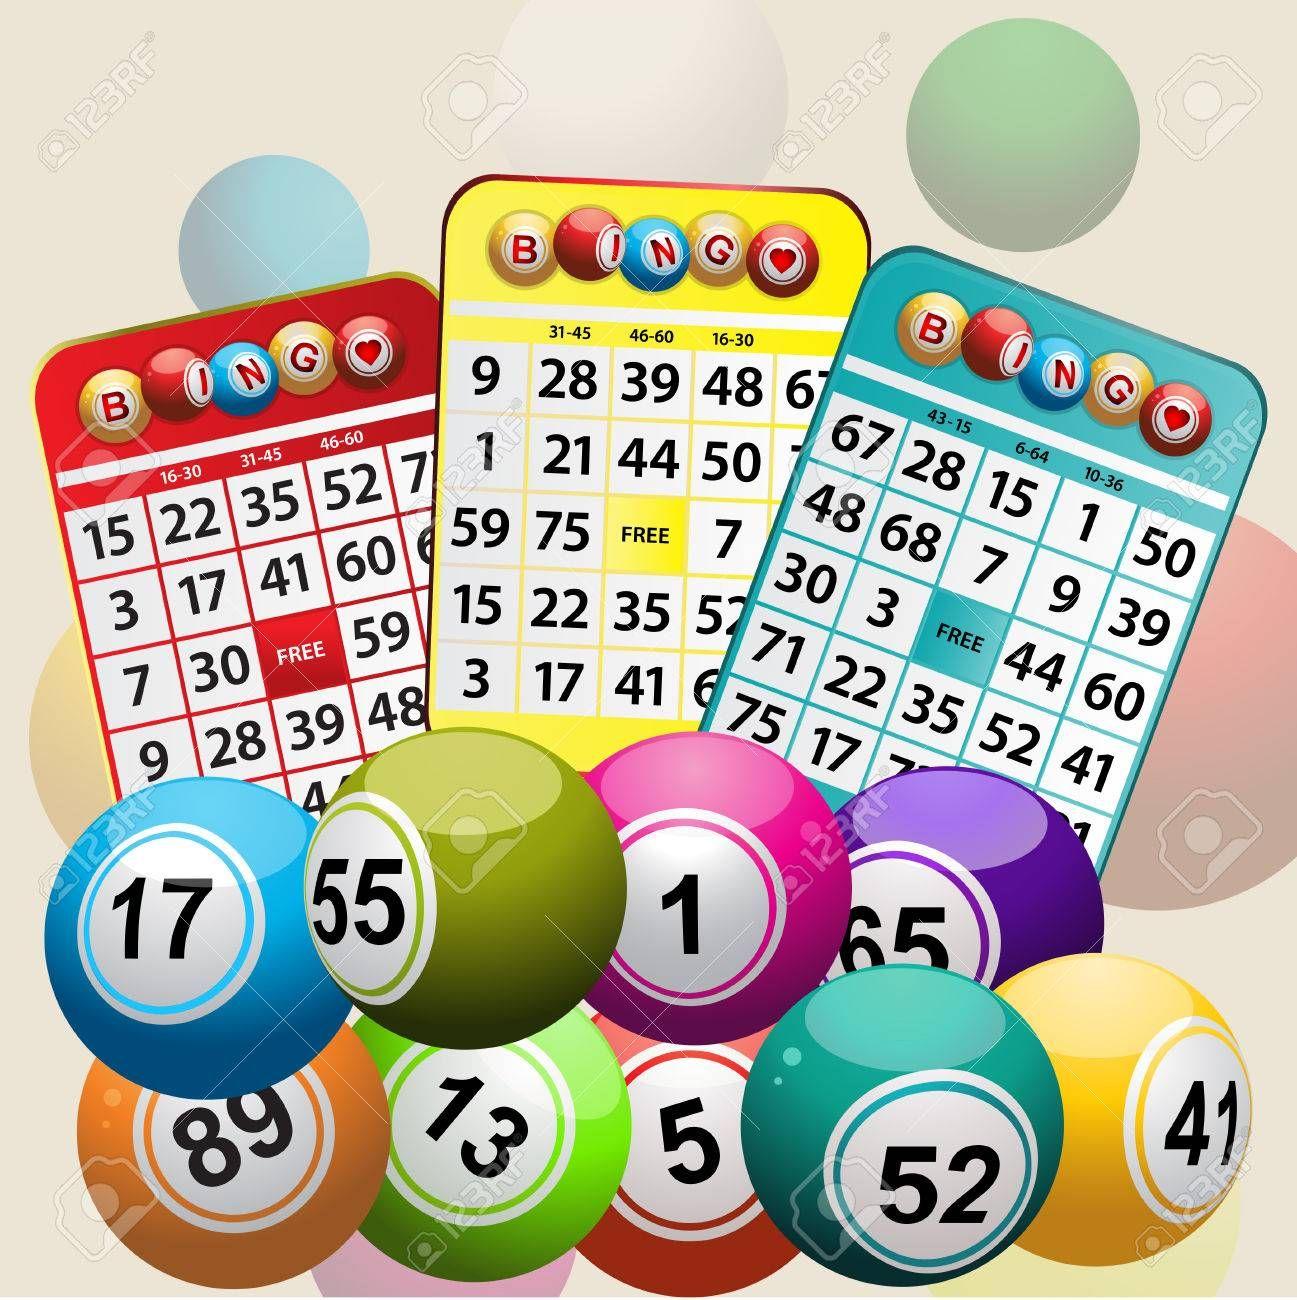 Set Of Bingo Cards And Bingo Balls Background Illustration Ad Cards Bingo Set Illustration Background Bingo Cards Bingo Cards